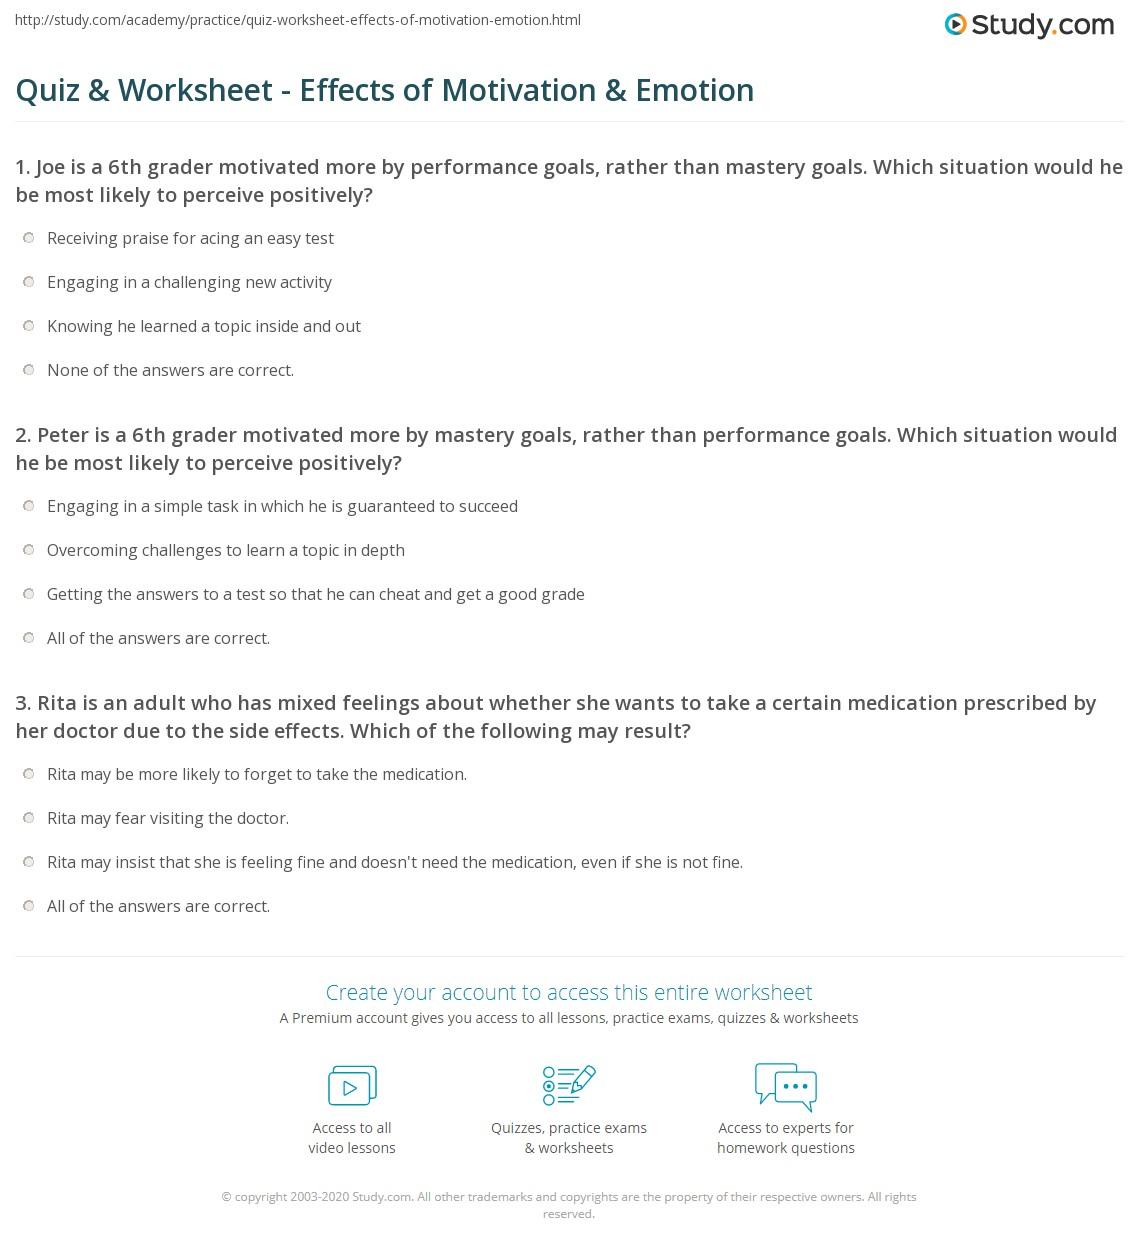 hight resolution of Quiz \u0026 Worksheet - Effects of Motivation \u0026 Emotion   Study.com